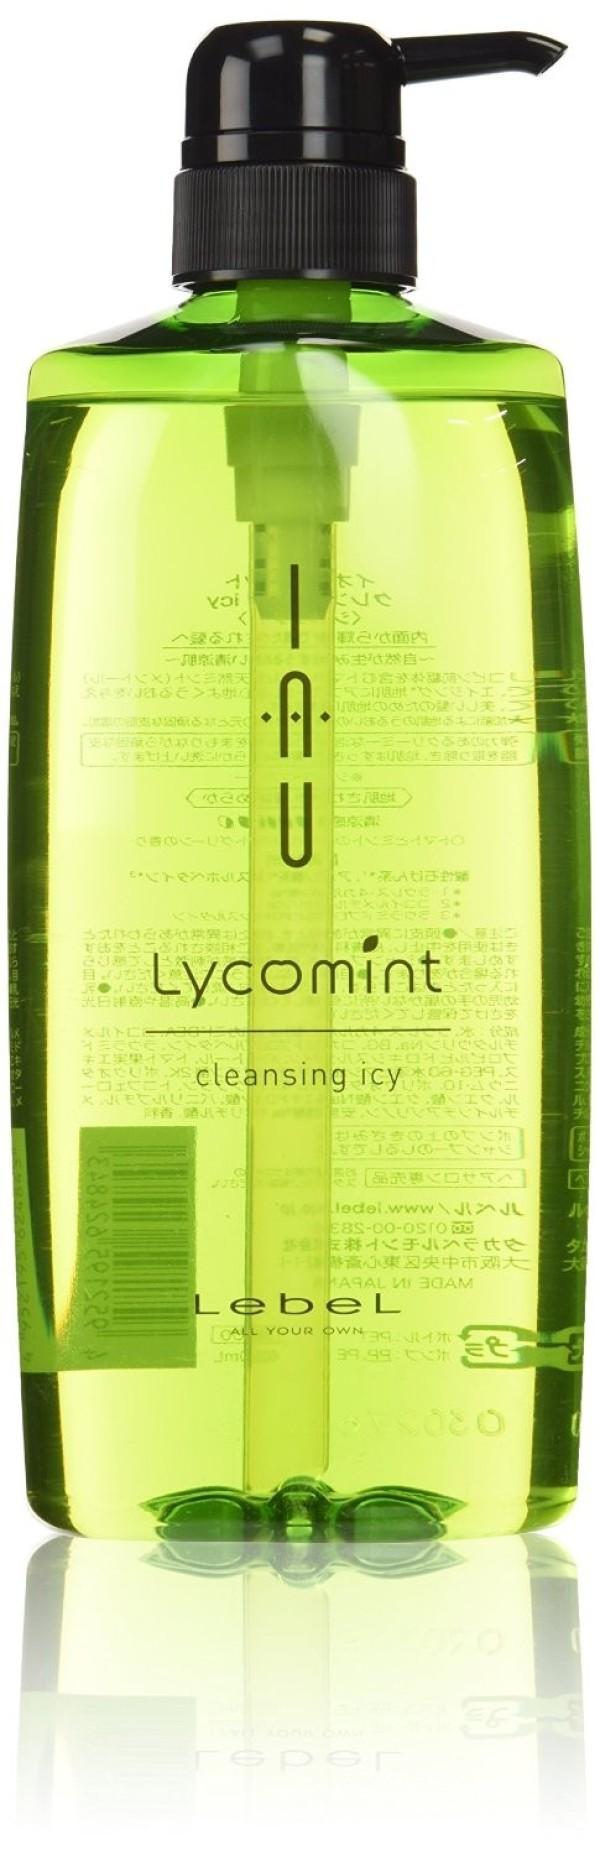 Охлаждающий антиоксидантный шампунь Lebel IAU Lycomint cleansing icy 600 мл